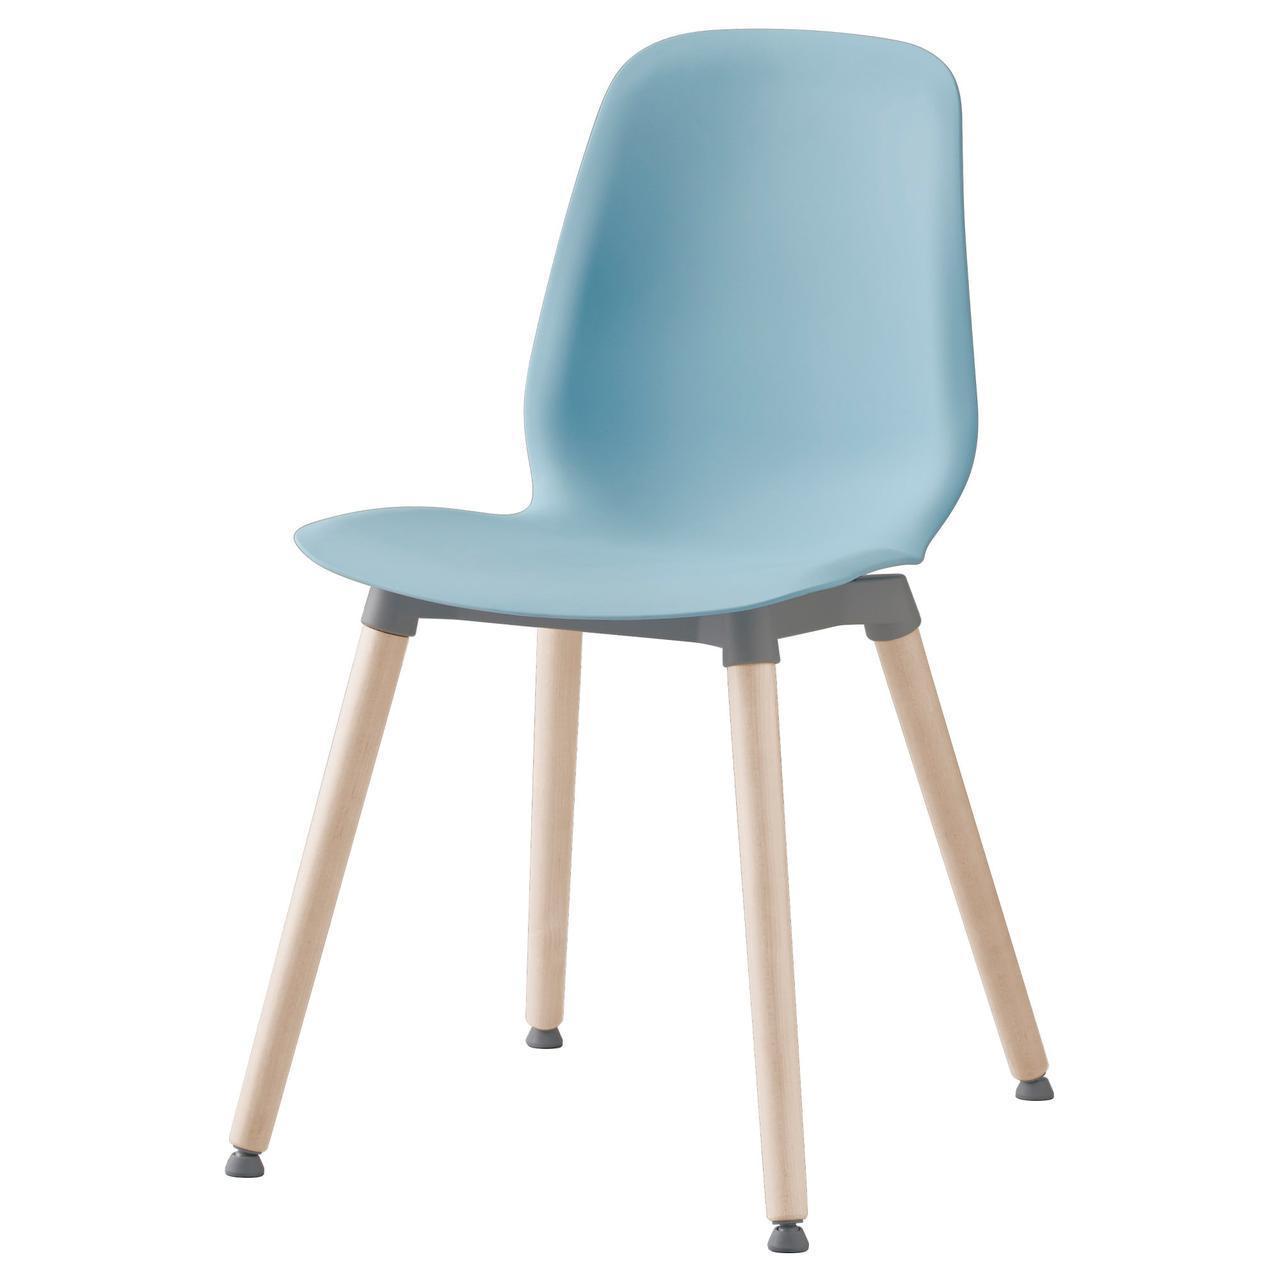 IKEA LEIFARNE Стул, светло-синий, Эрнфрид береза  (991.278.06)